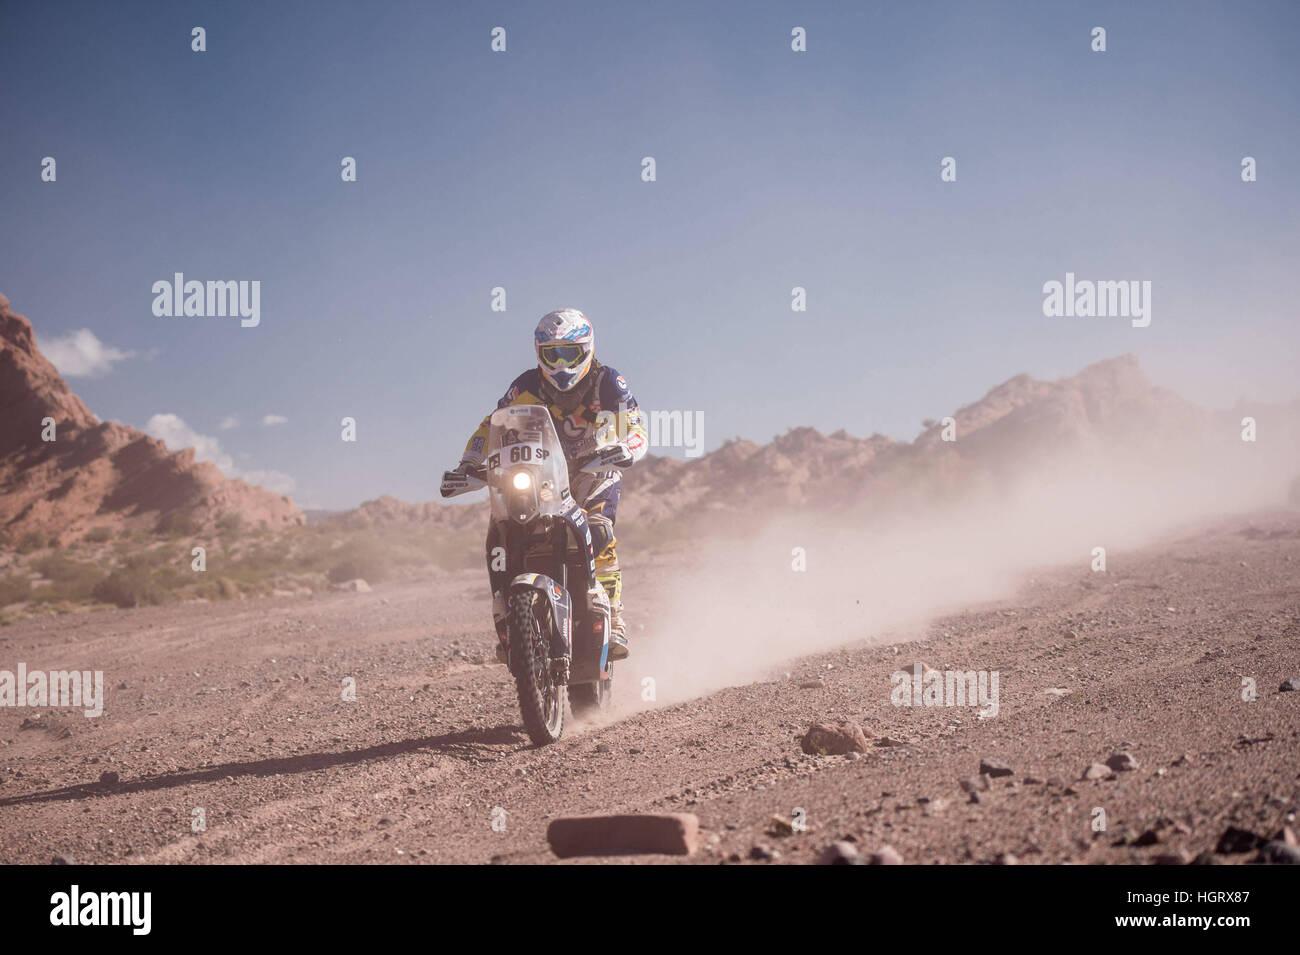 San Juan, Argentina. 12th Jan, 2017. 060 Ivanitun Aleksandr (RUS) Husqvarna during the Dakar Rally 2017. © - Stock Image